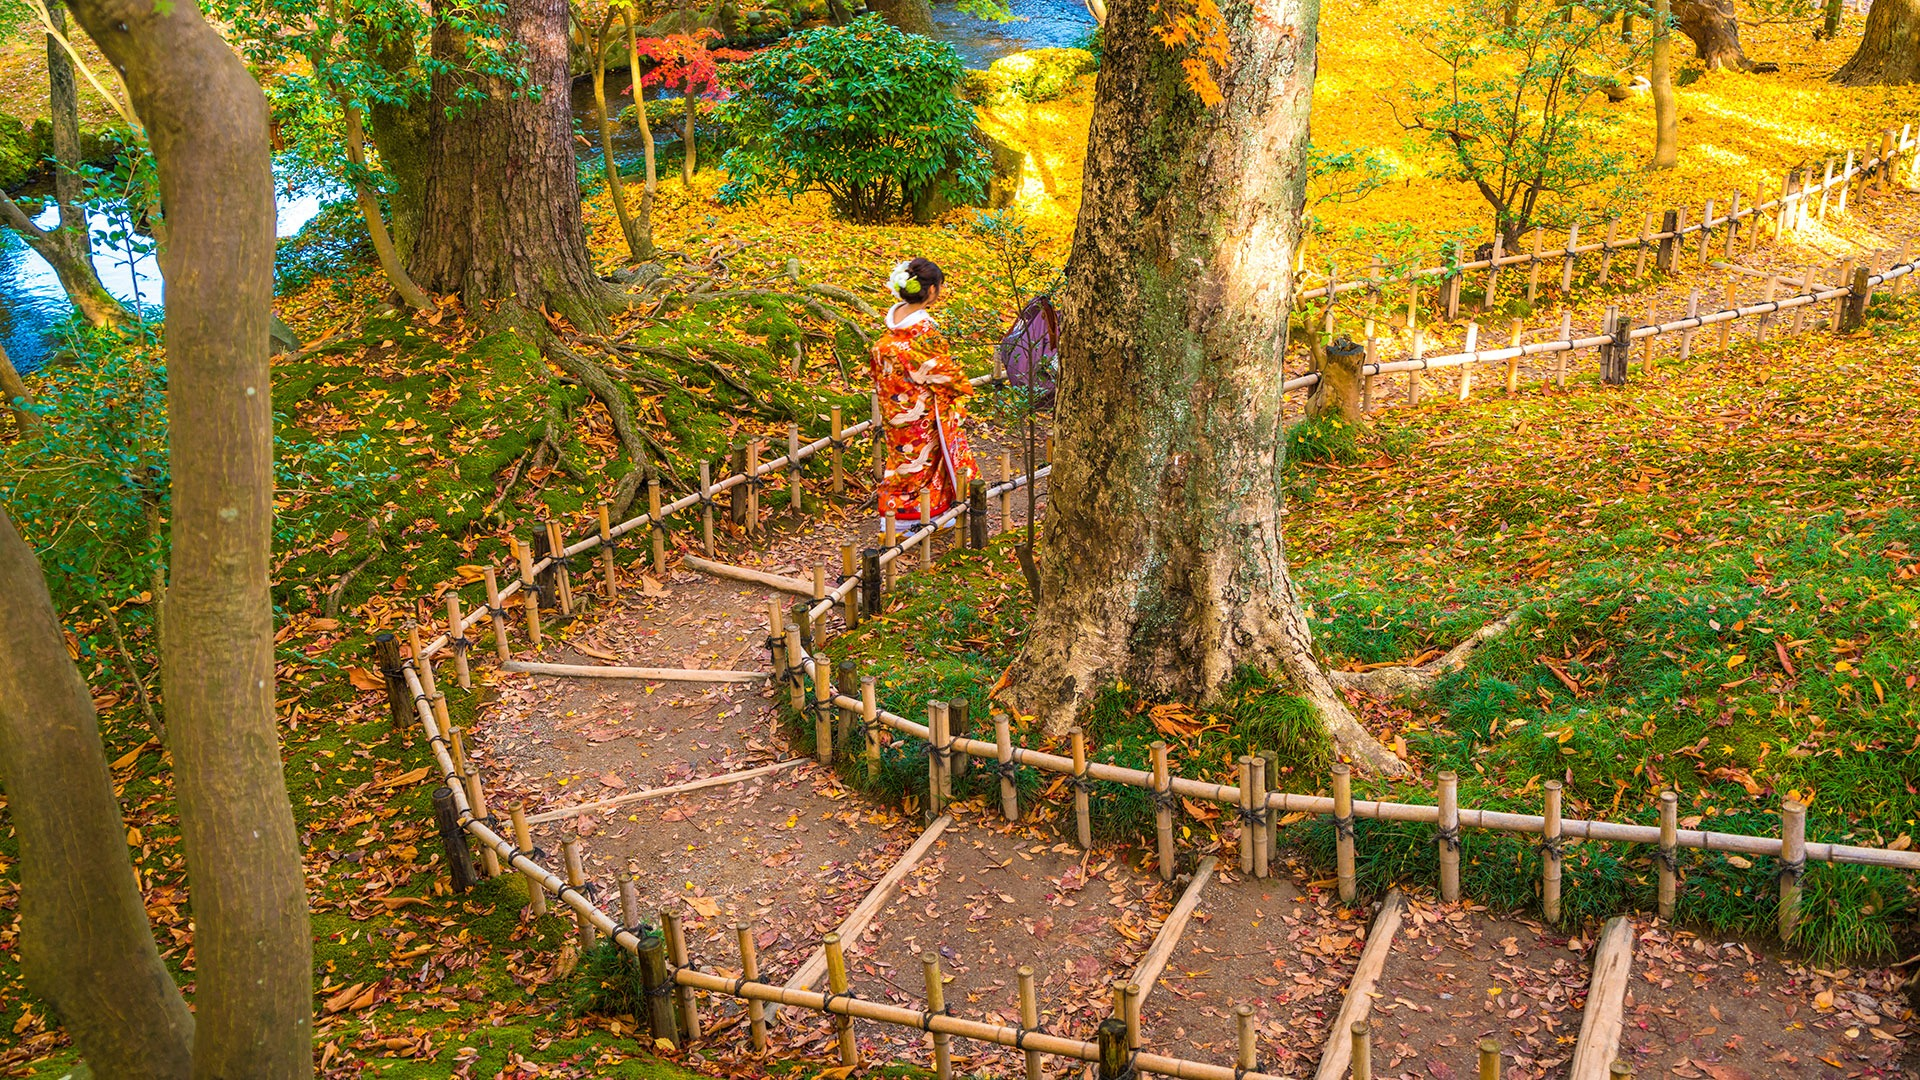 Japanese woman in traditional dress, Kenrokuen Garden, Kanazawa, Japan